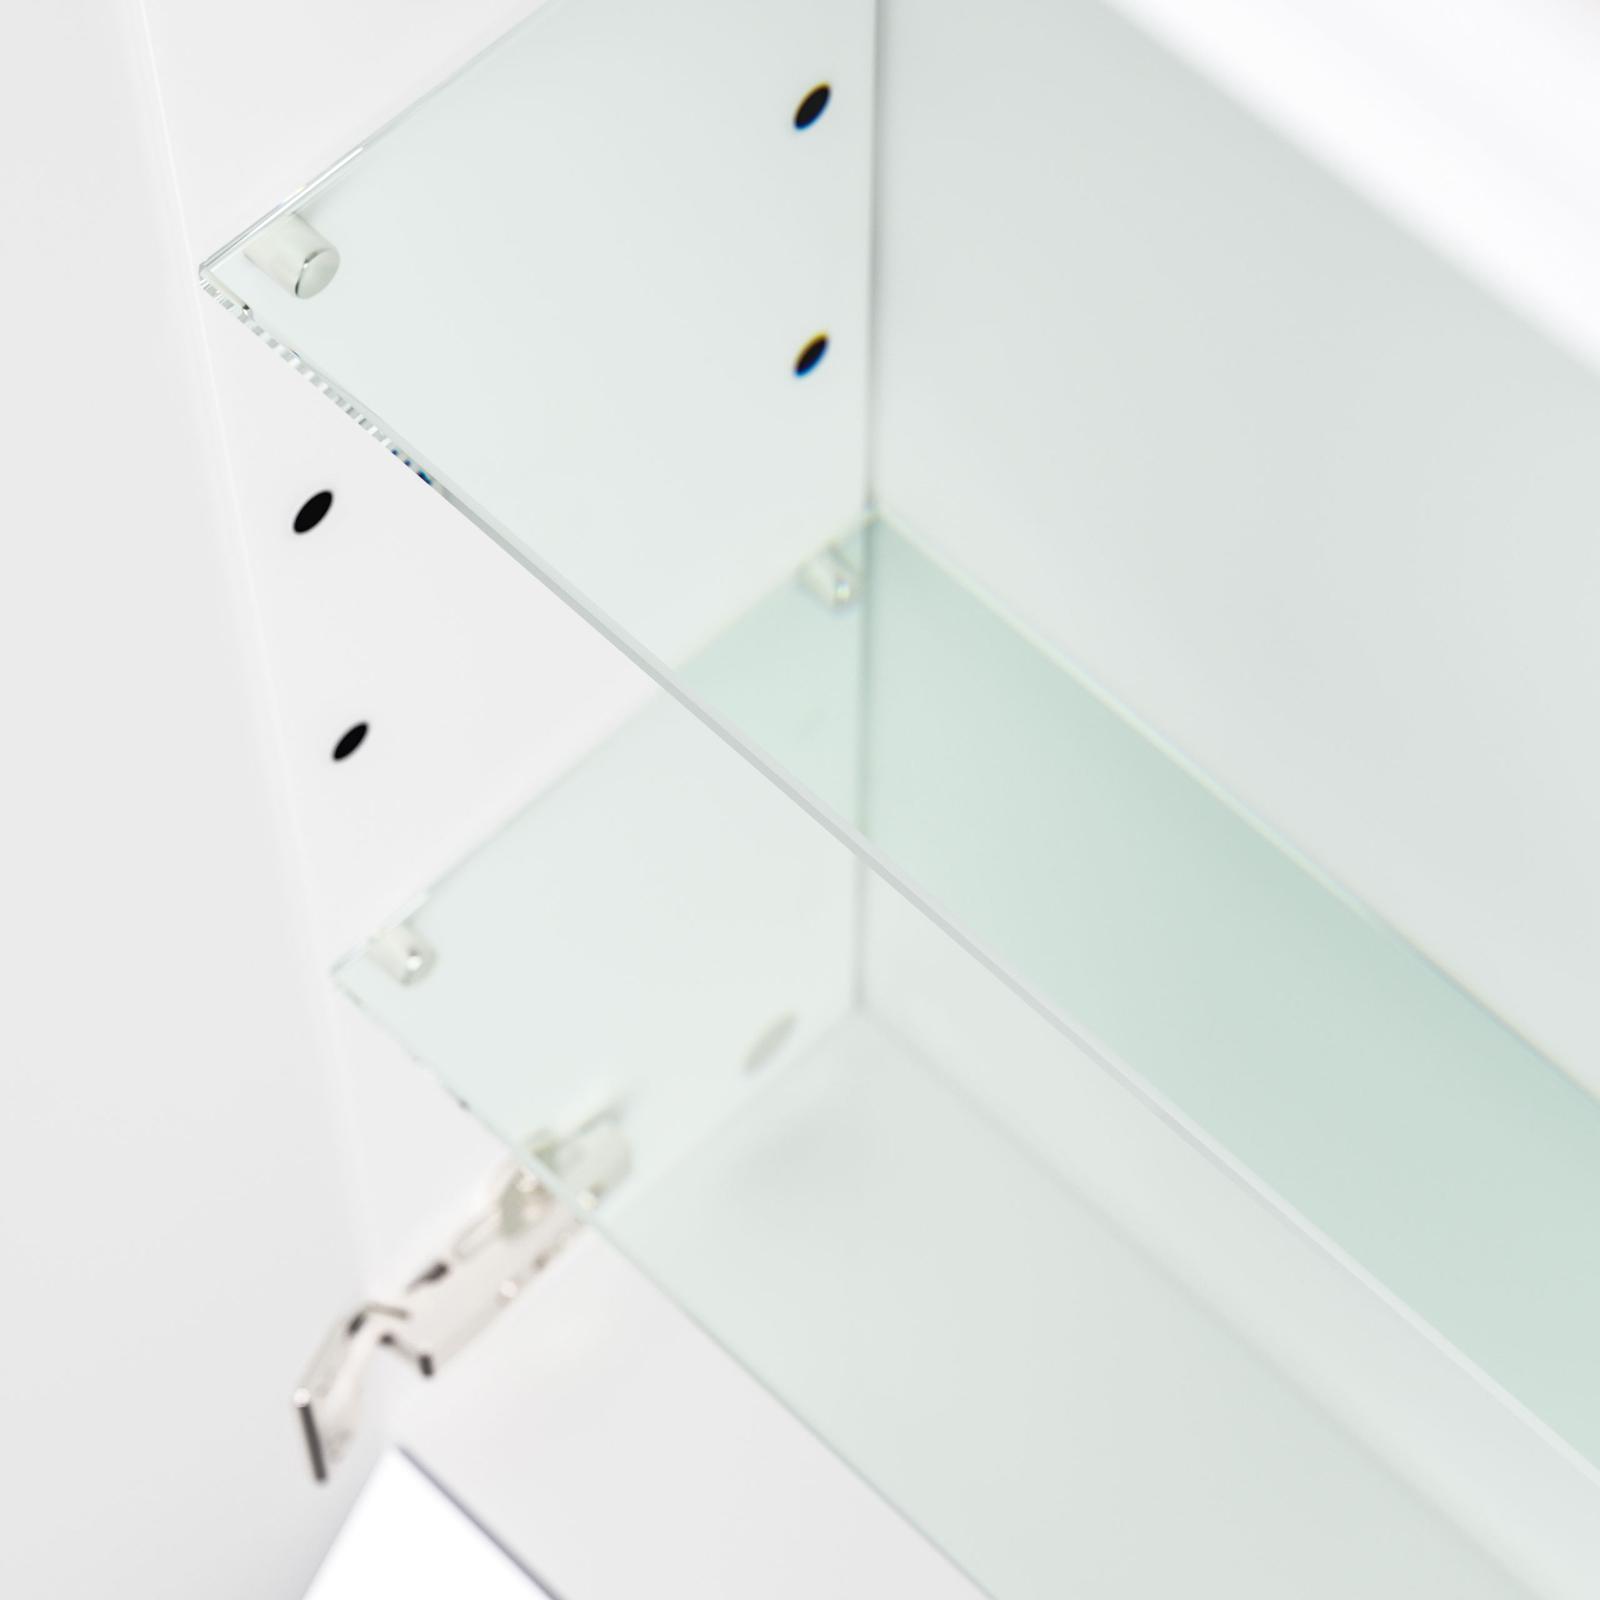 essgruppe tischgruppe wei hochglanz lack tristan2. Black Bedroom Furniture Sets. Home Design Ideas